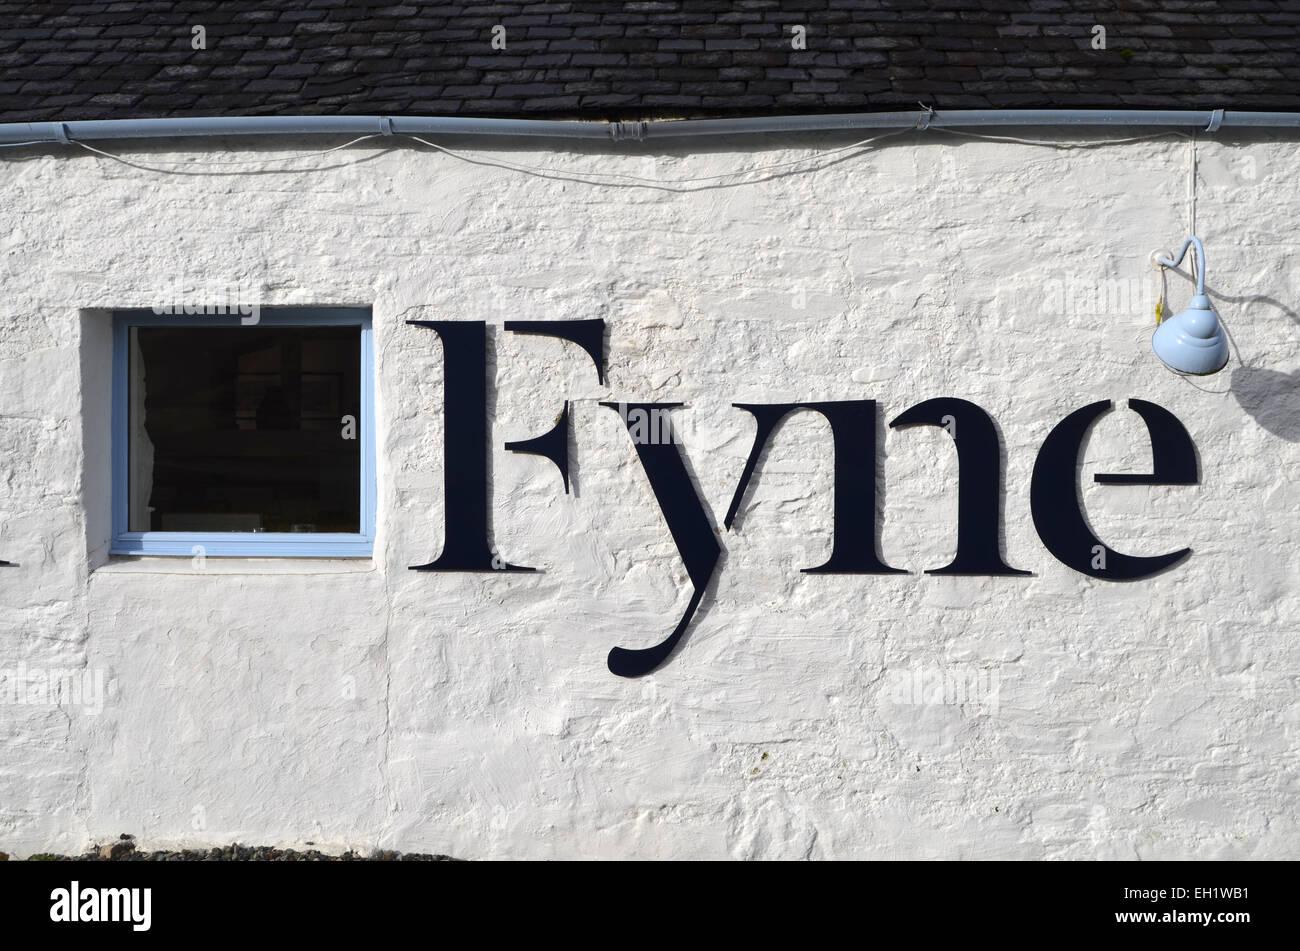 Loch Fyne seafood restaurant, Scotland - Stock Image